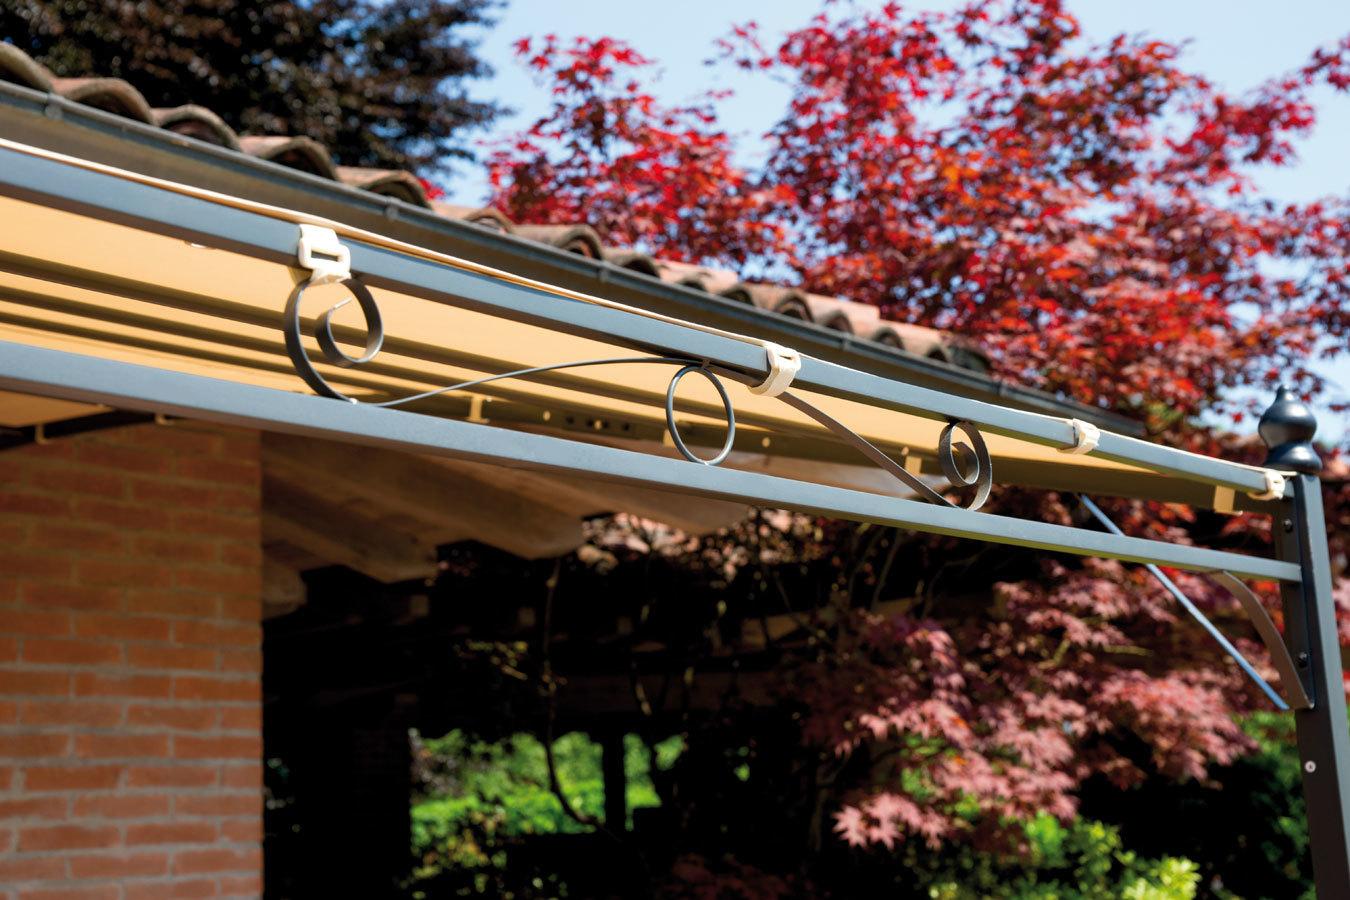 Gazebo pergola 4x3 giardino terrazza top design telo for Soluzioni giardino in pendenza